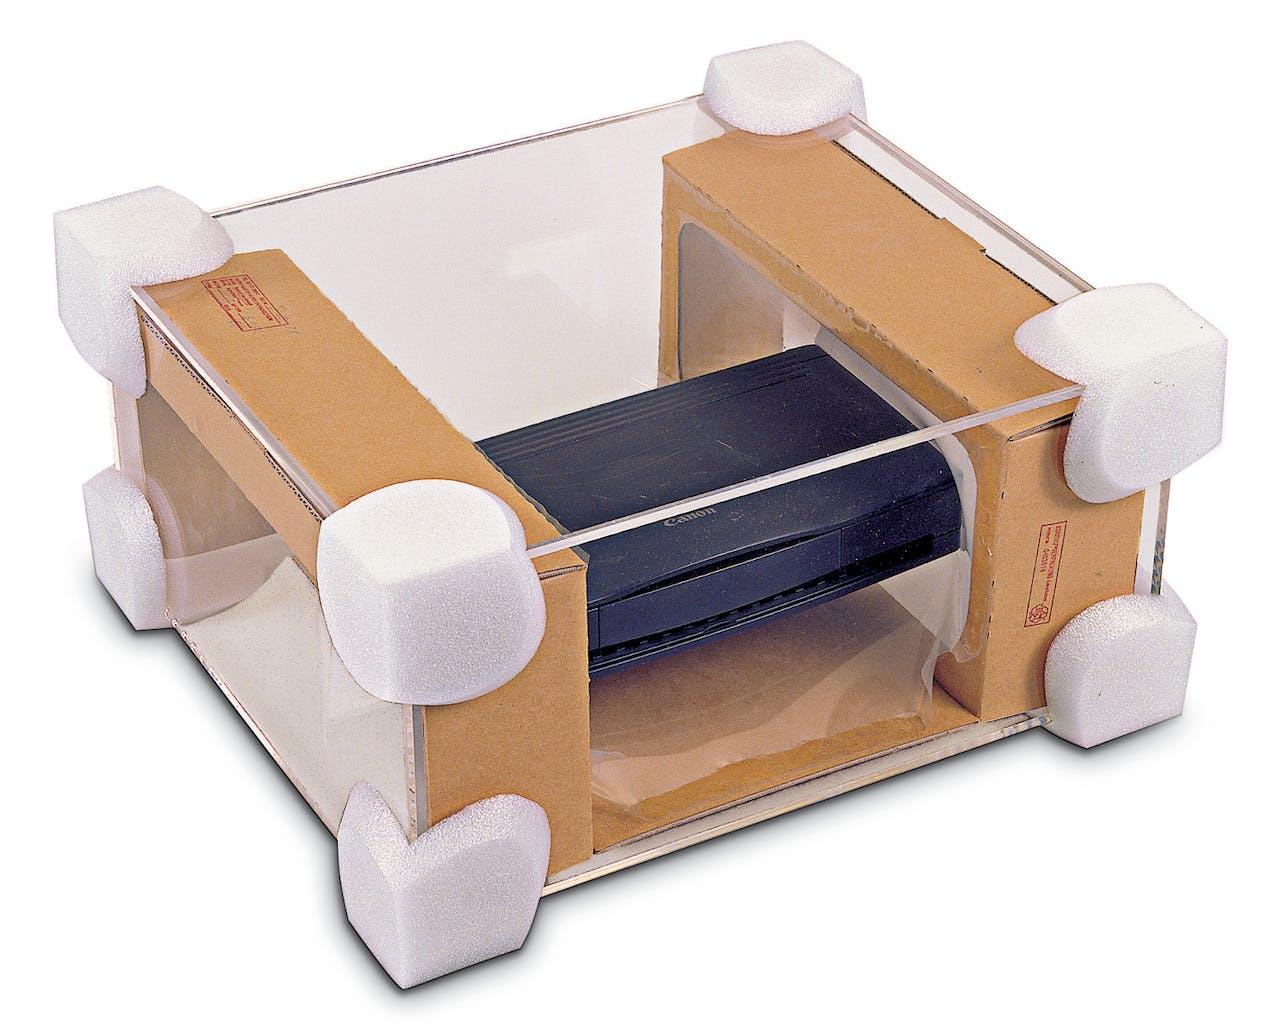 Kantenschutzecken aus Schaumstoff an Paket